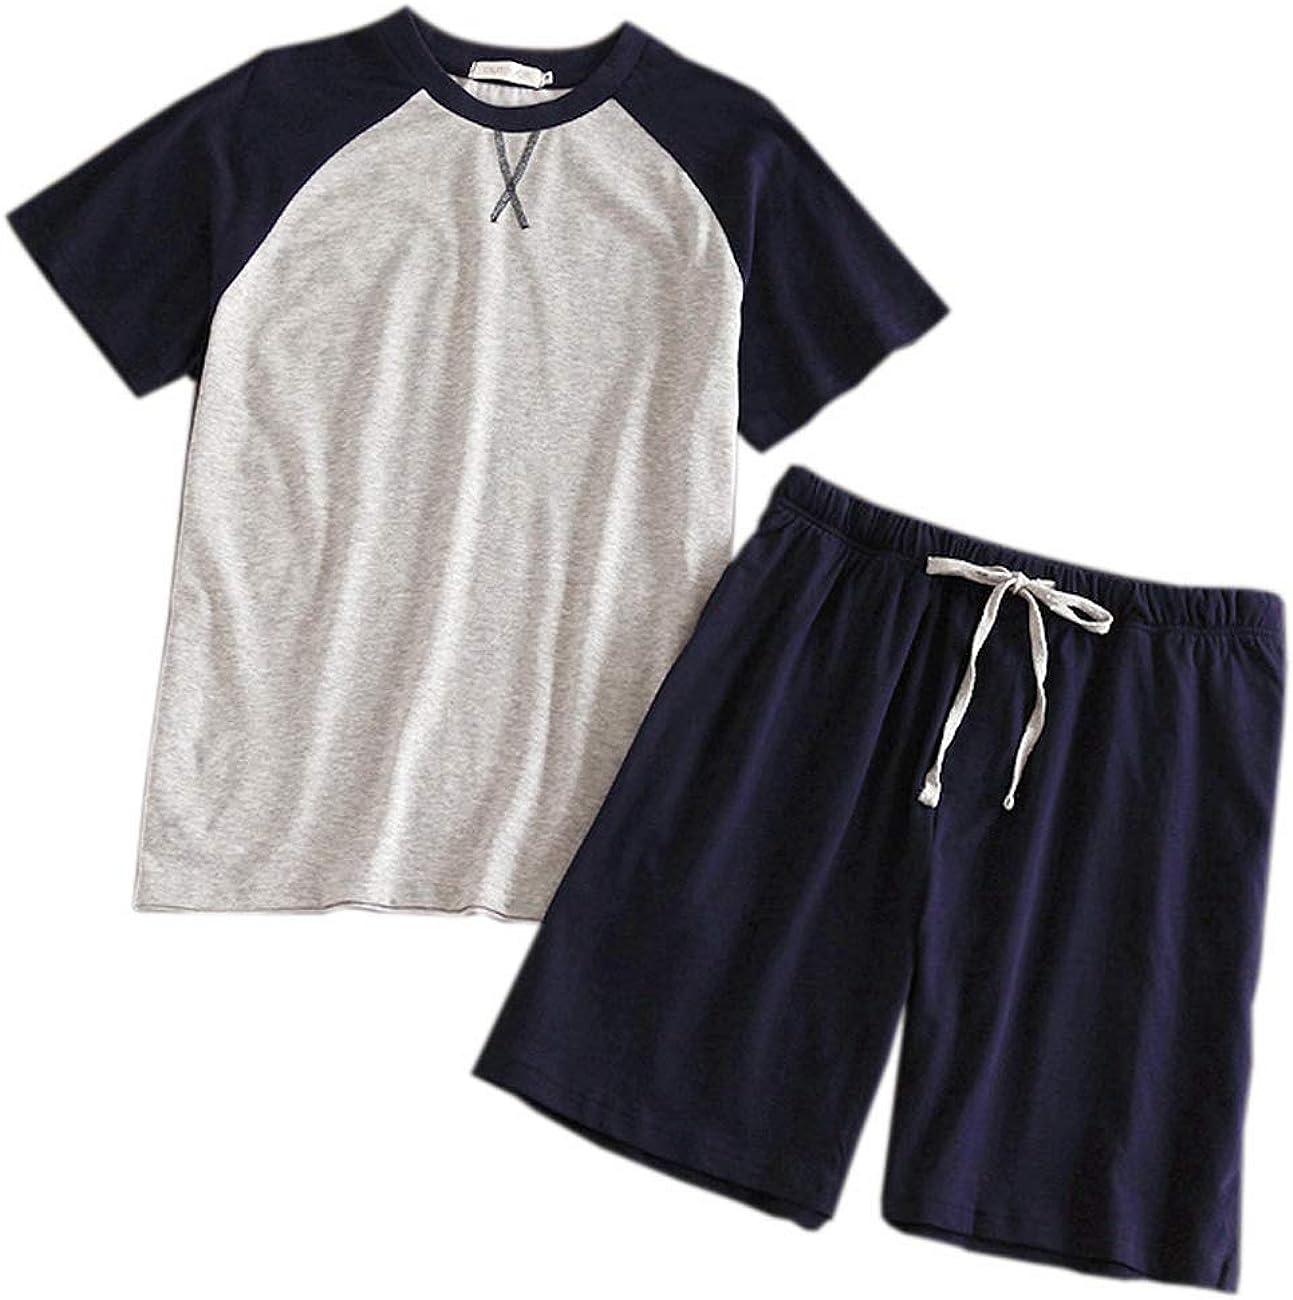 GLOSTORY Men Two Piece Cotton Pajamas Sets Summer Short Sleeve T shirts with Shorts Sleepwear Set